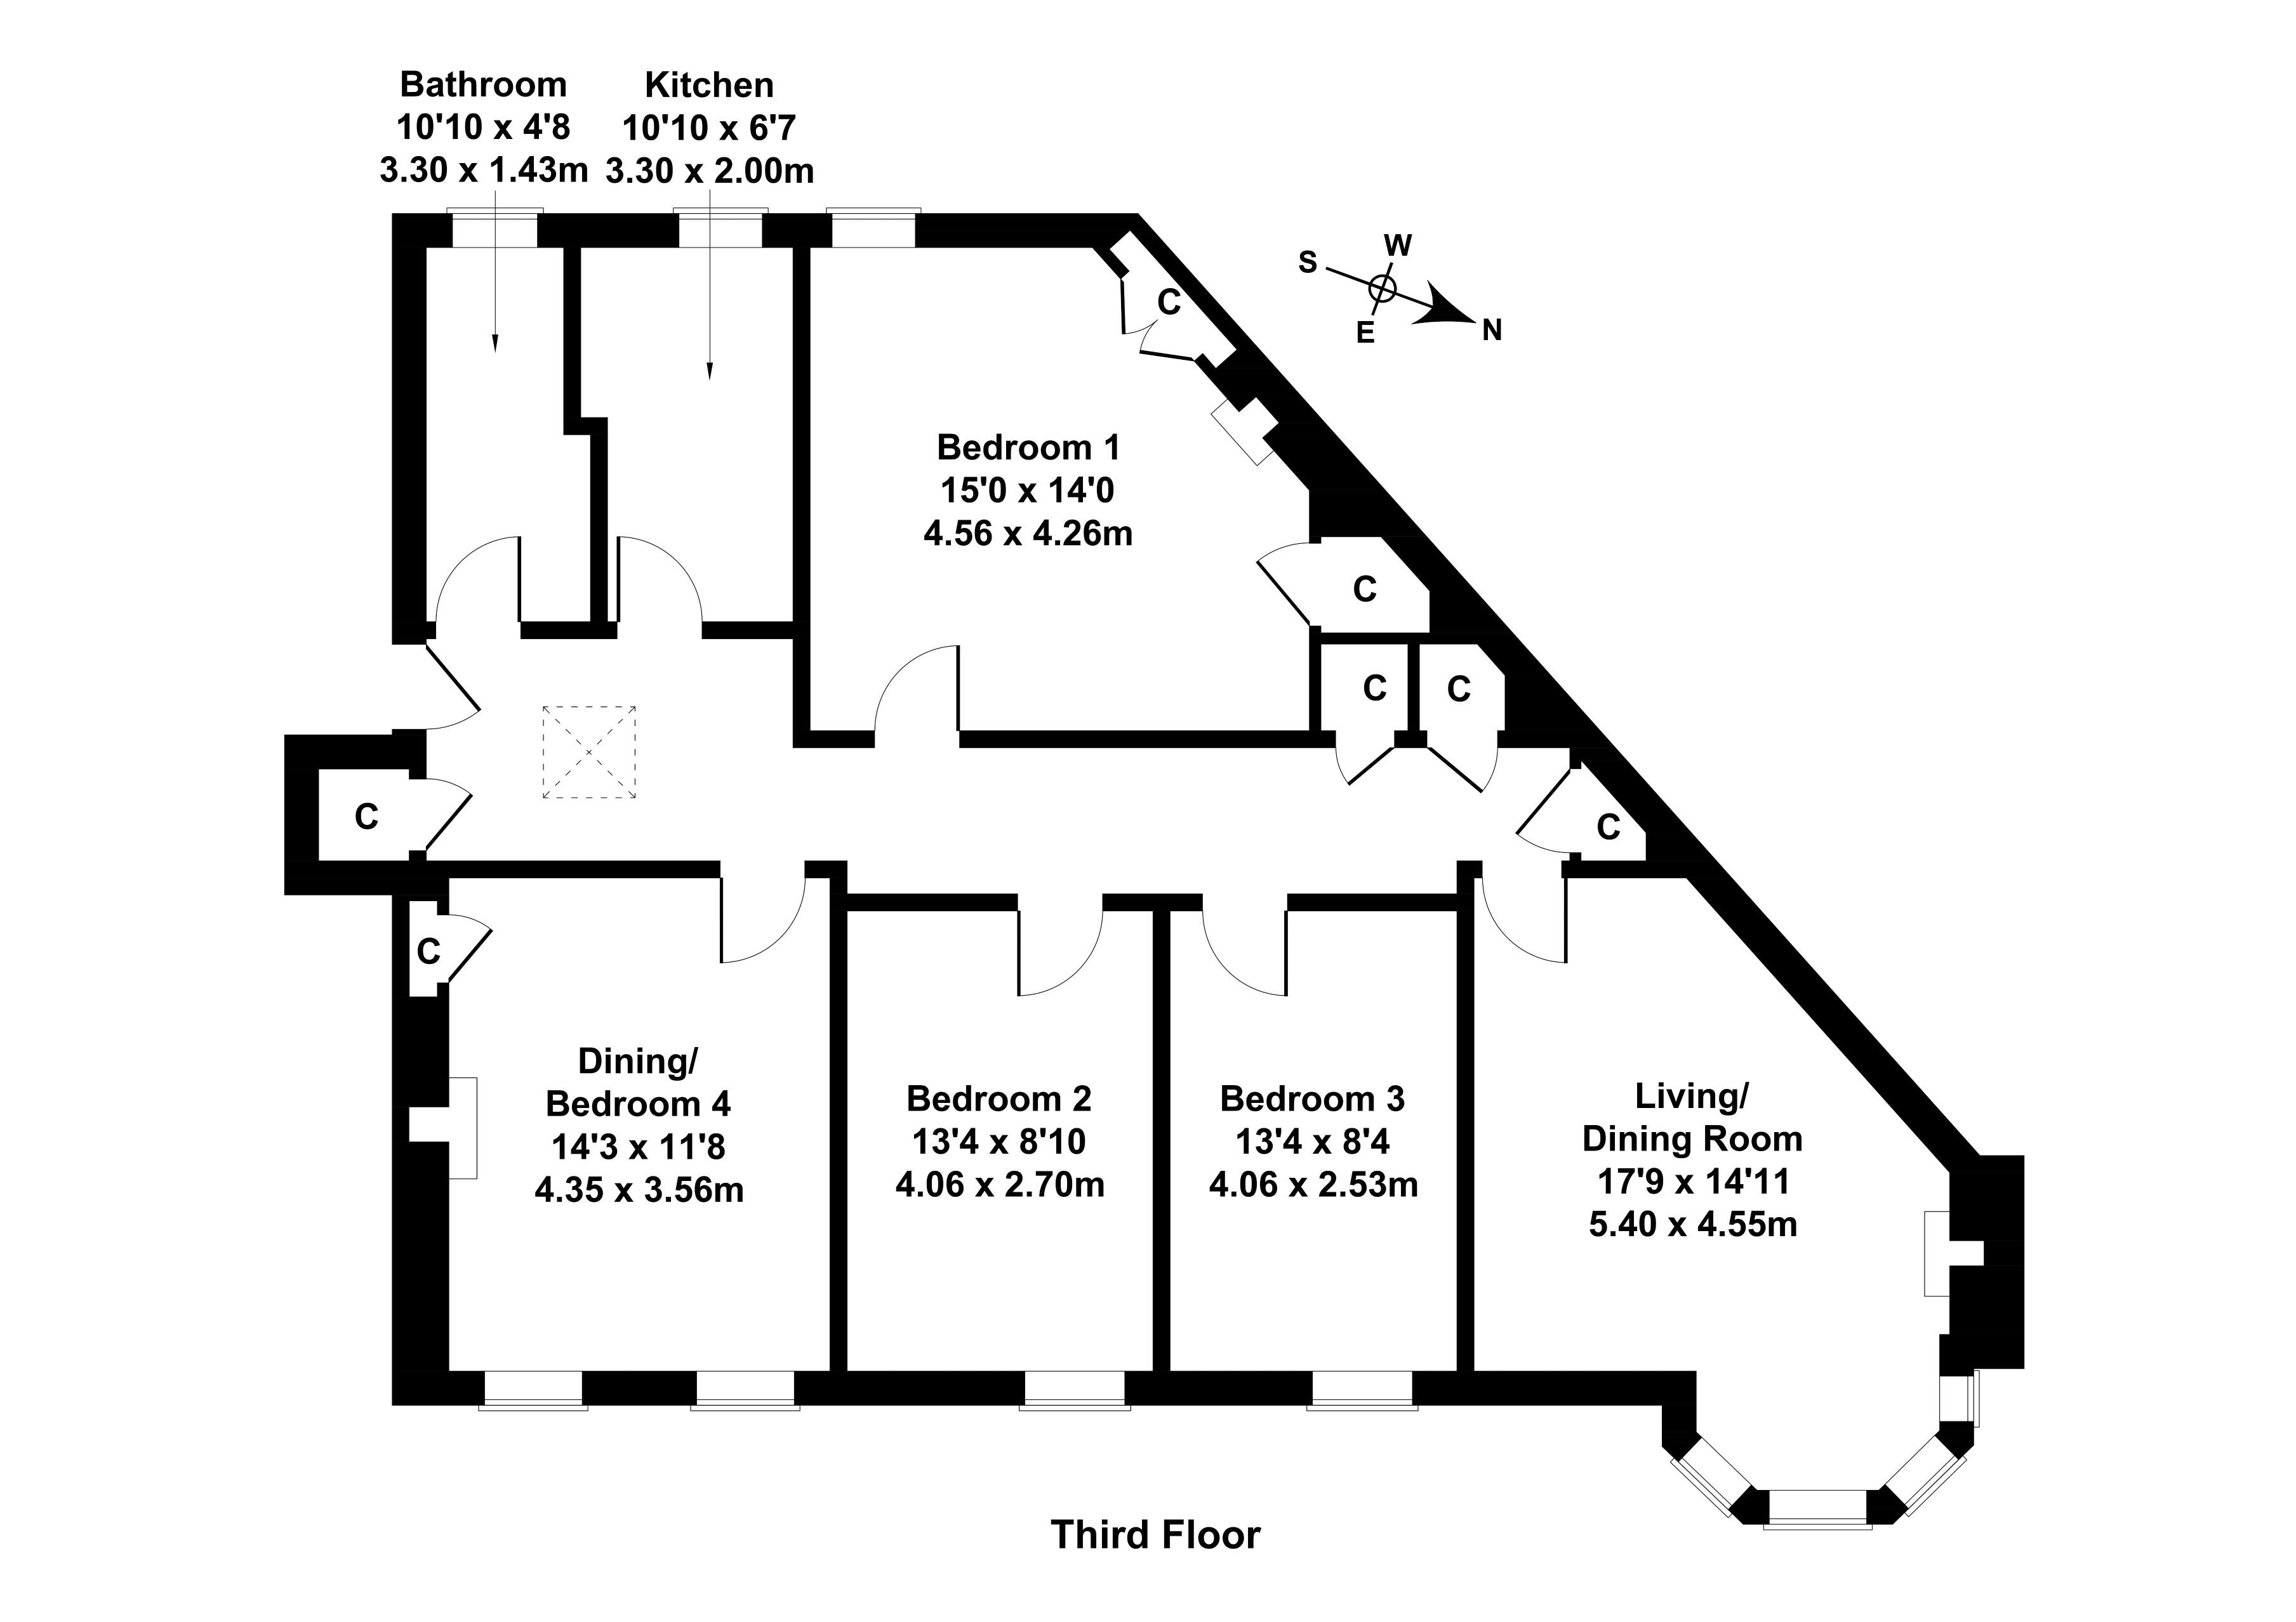 Floorplan 1 of 4/5, Western Gardens, Murrayfield, Edinburgh, EH12 5QD